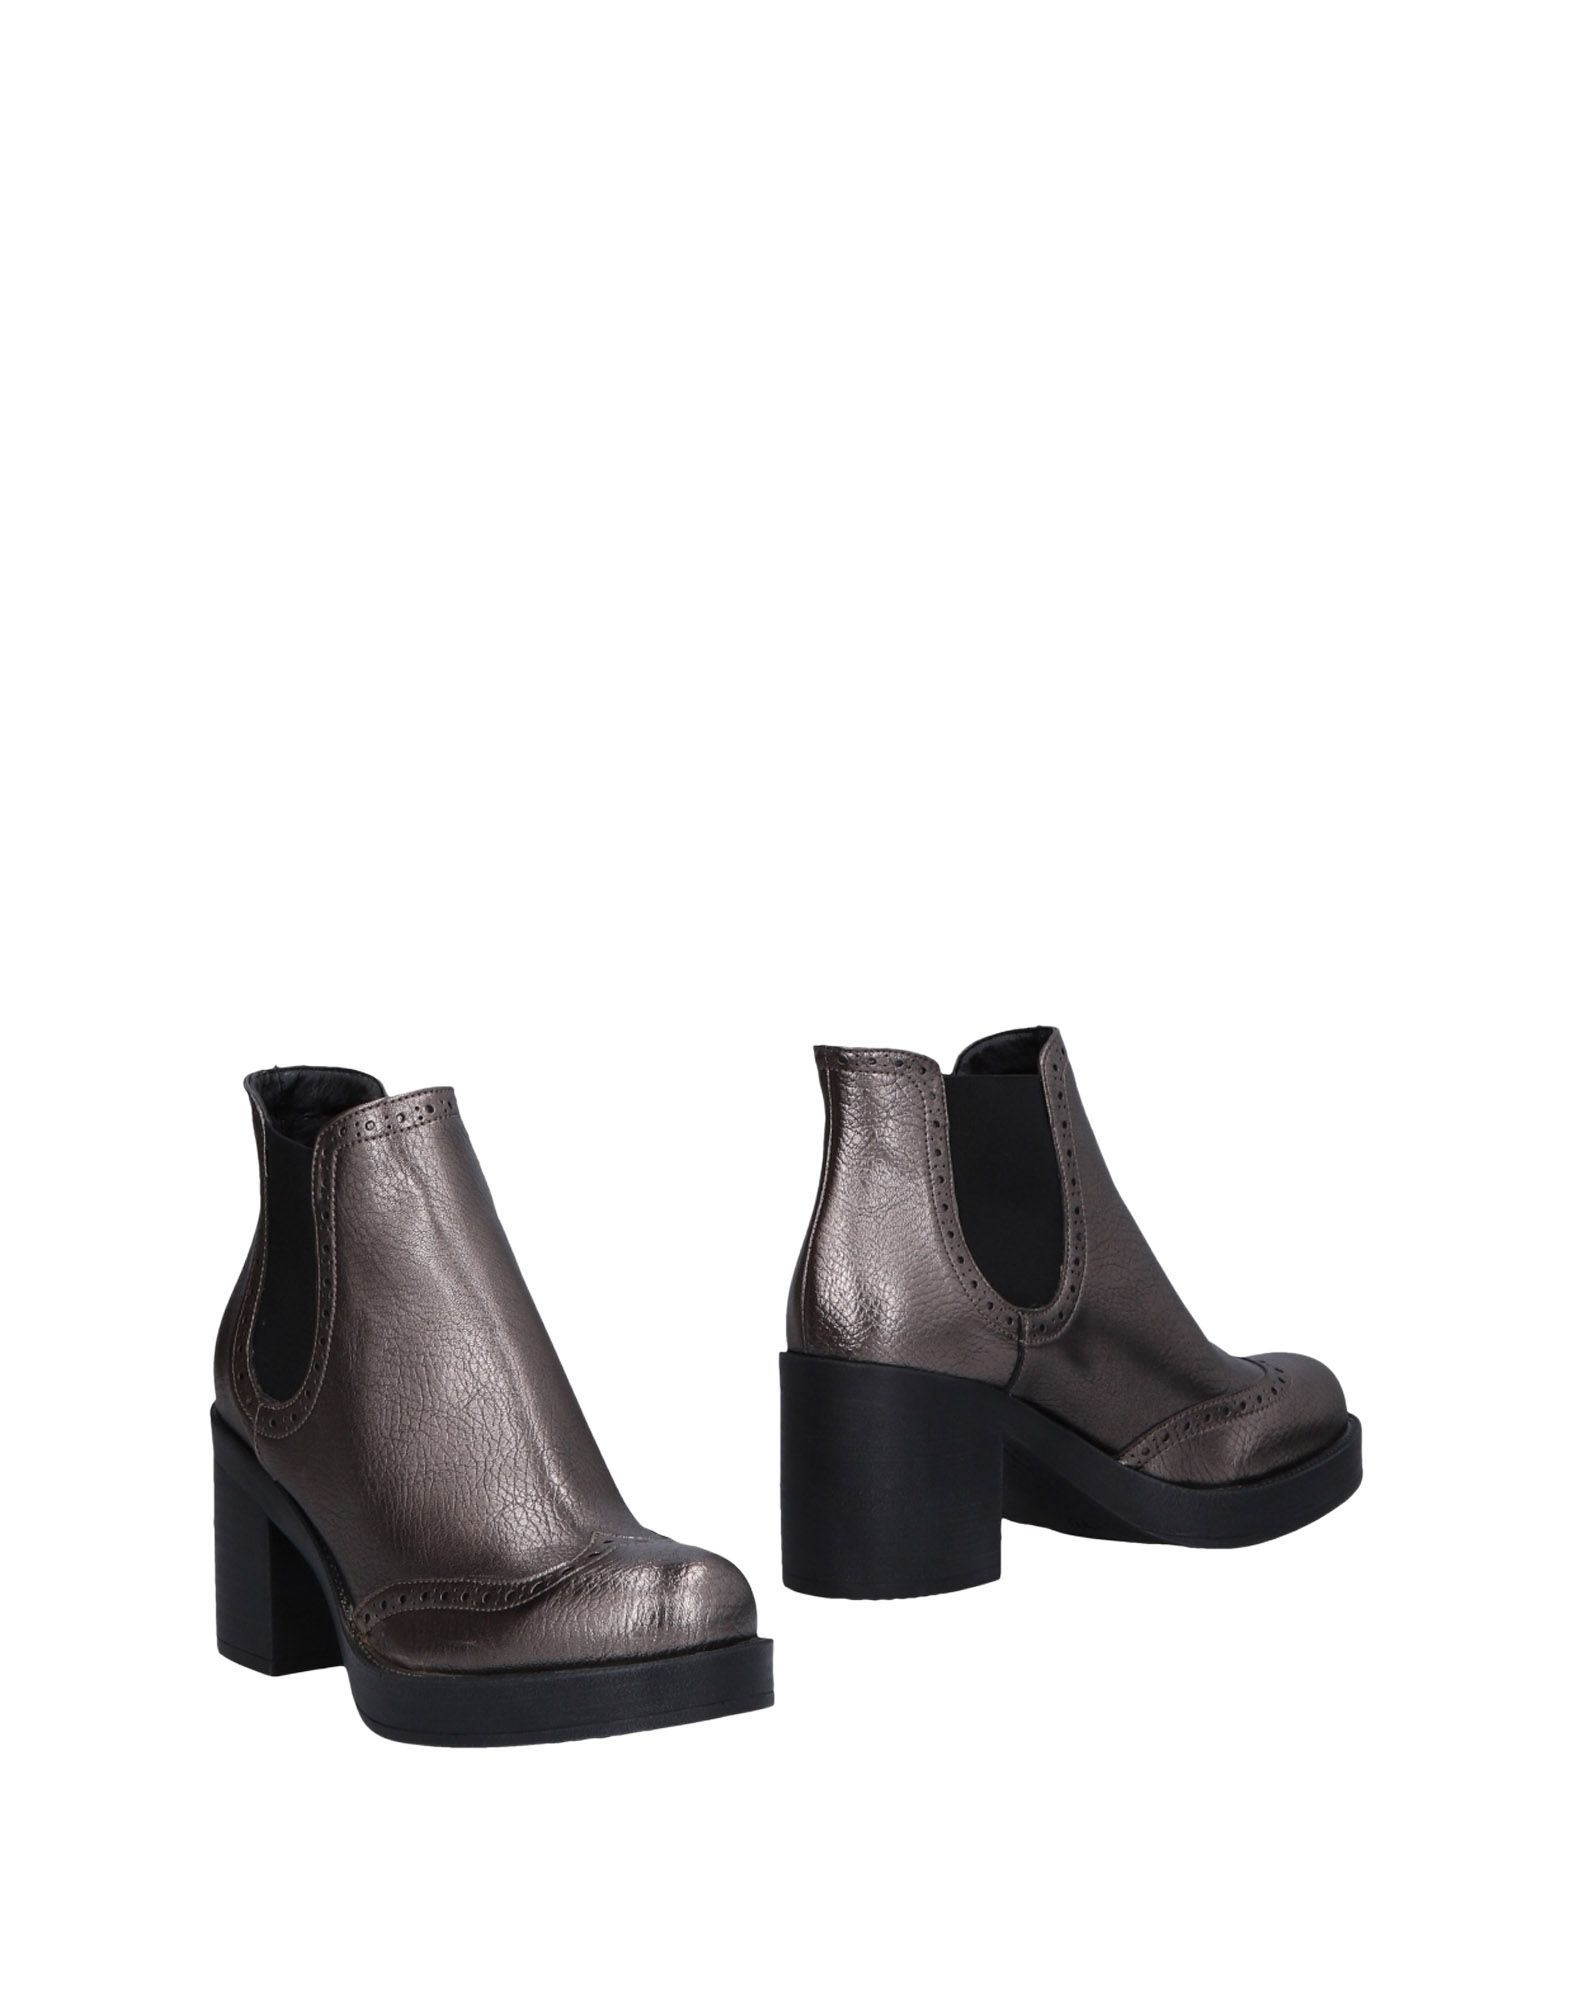 Formentini 11478955MC Chelsea Boots Damen  11478955MC Formentini Gute Qualität beliebte Schuhe 8c7d36